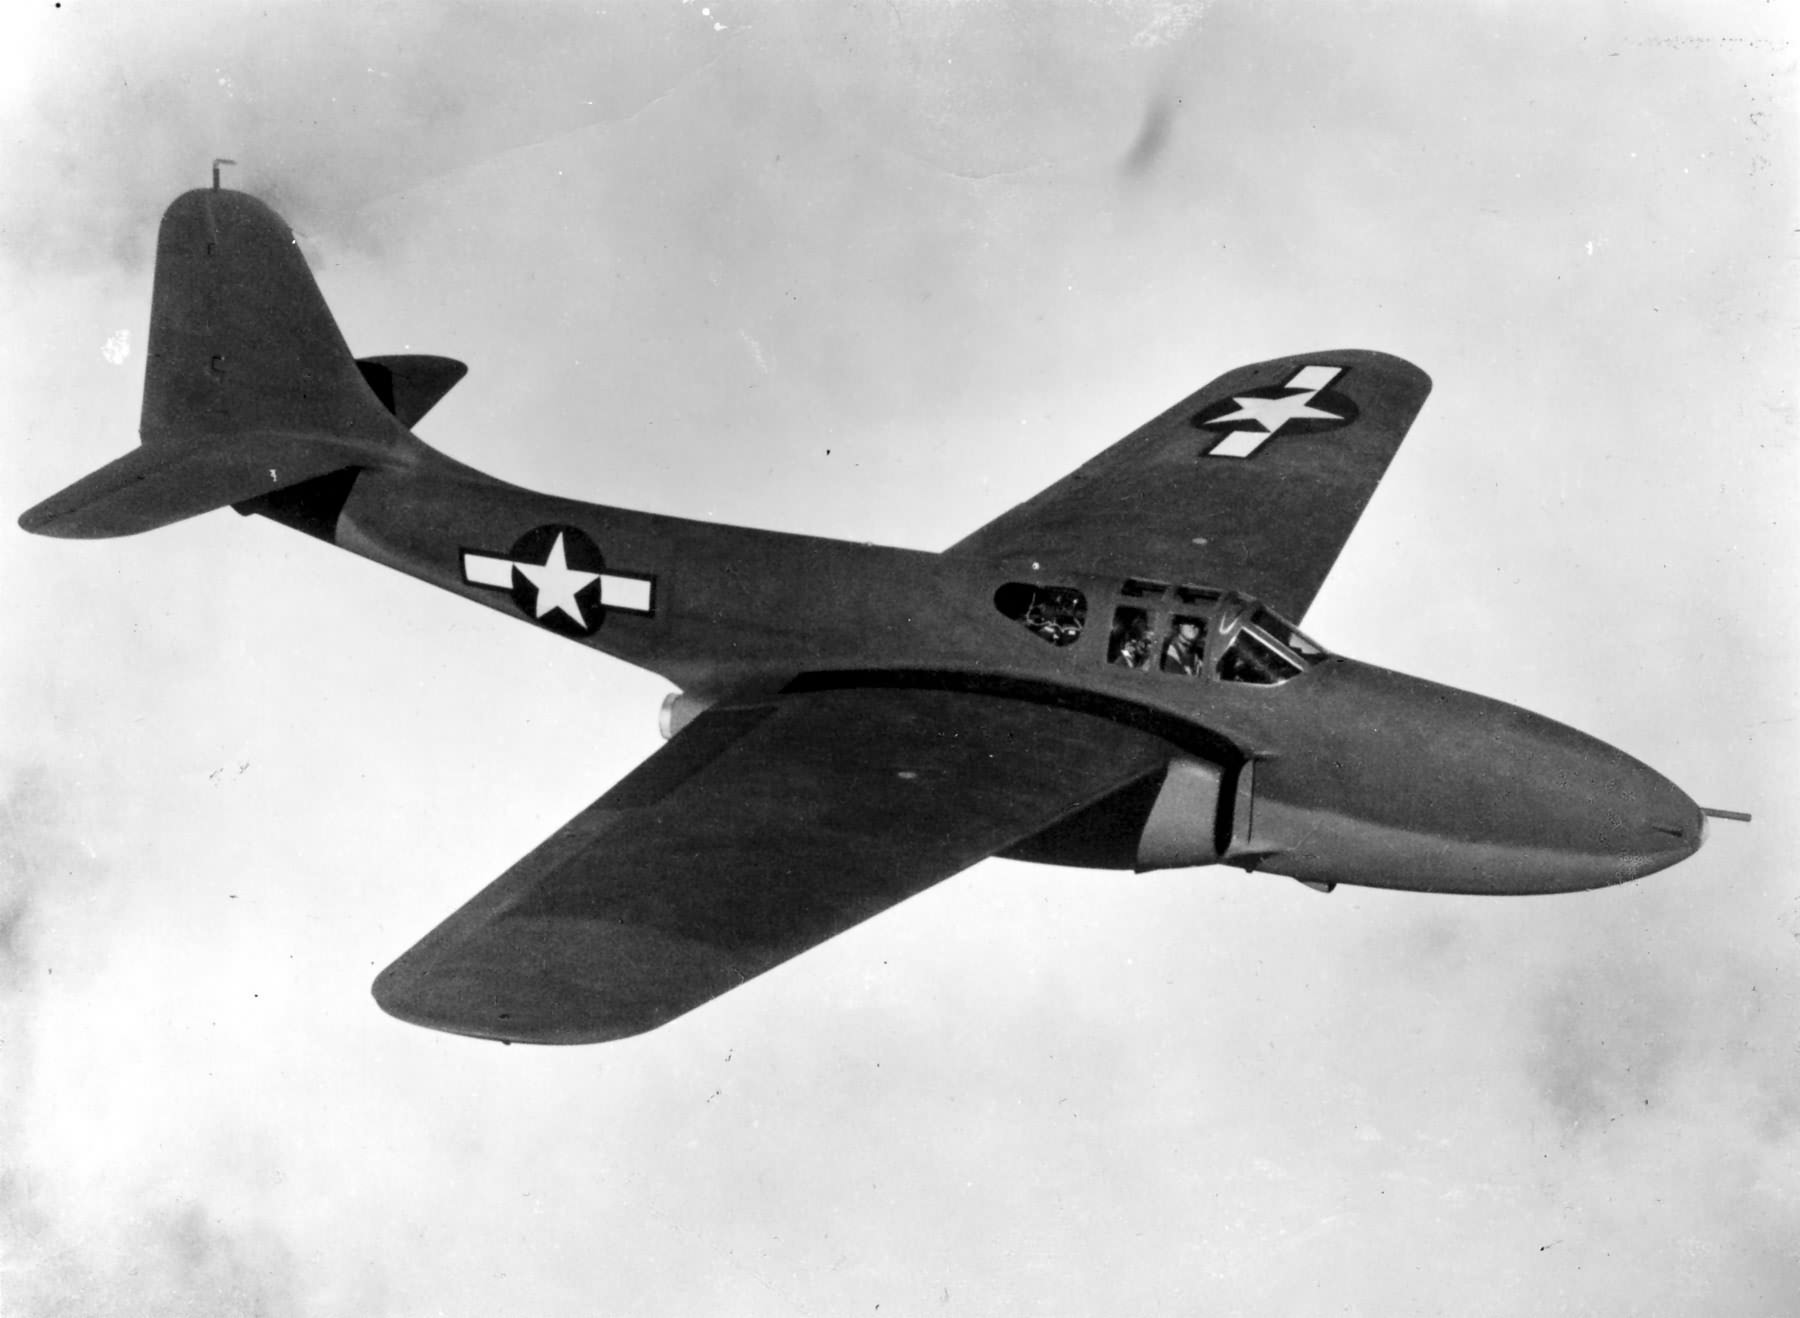 Prototype Bell XP-59 in a test flight | World War Photos